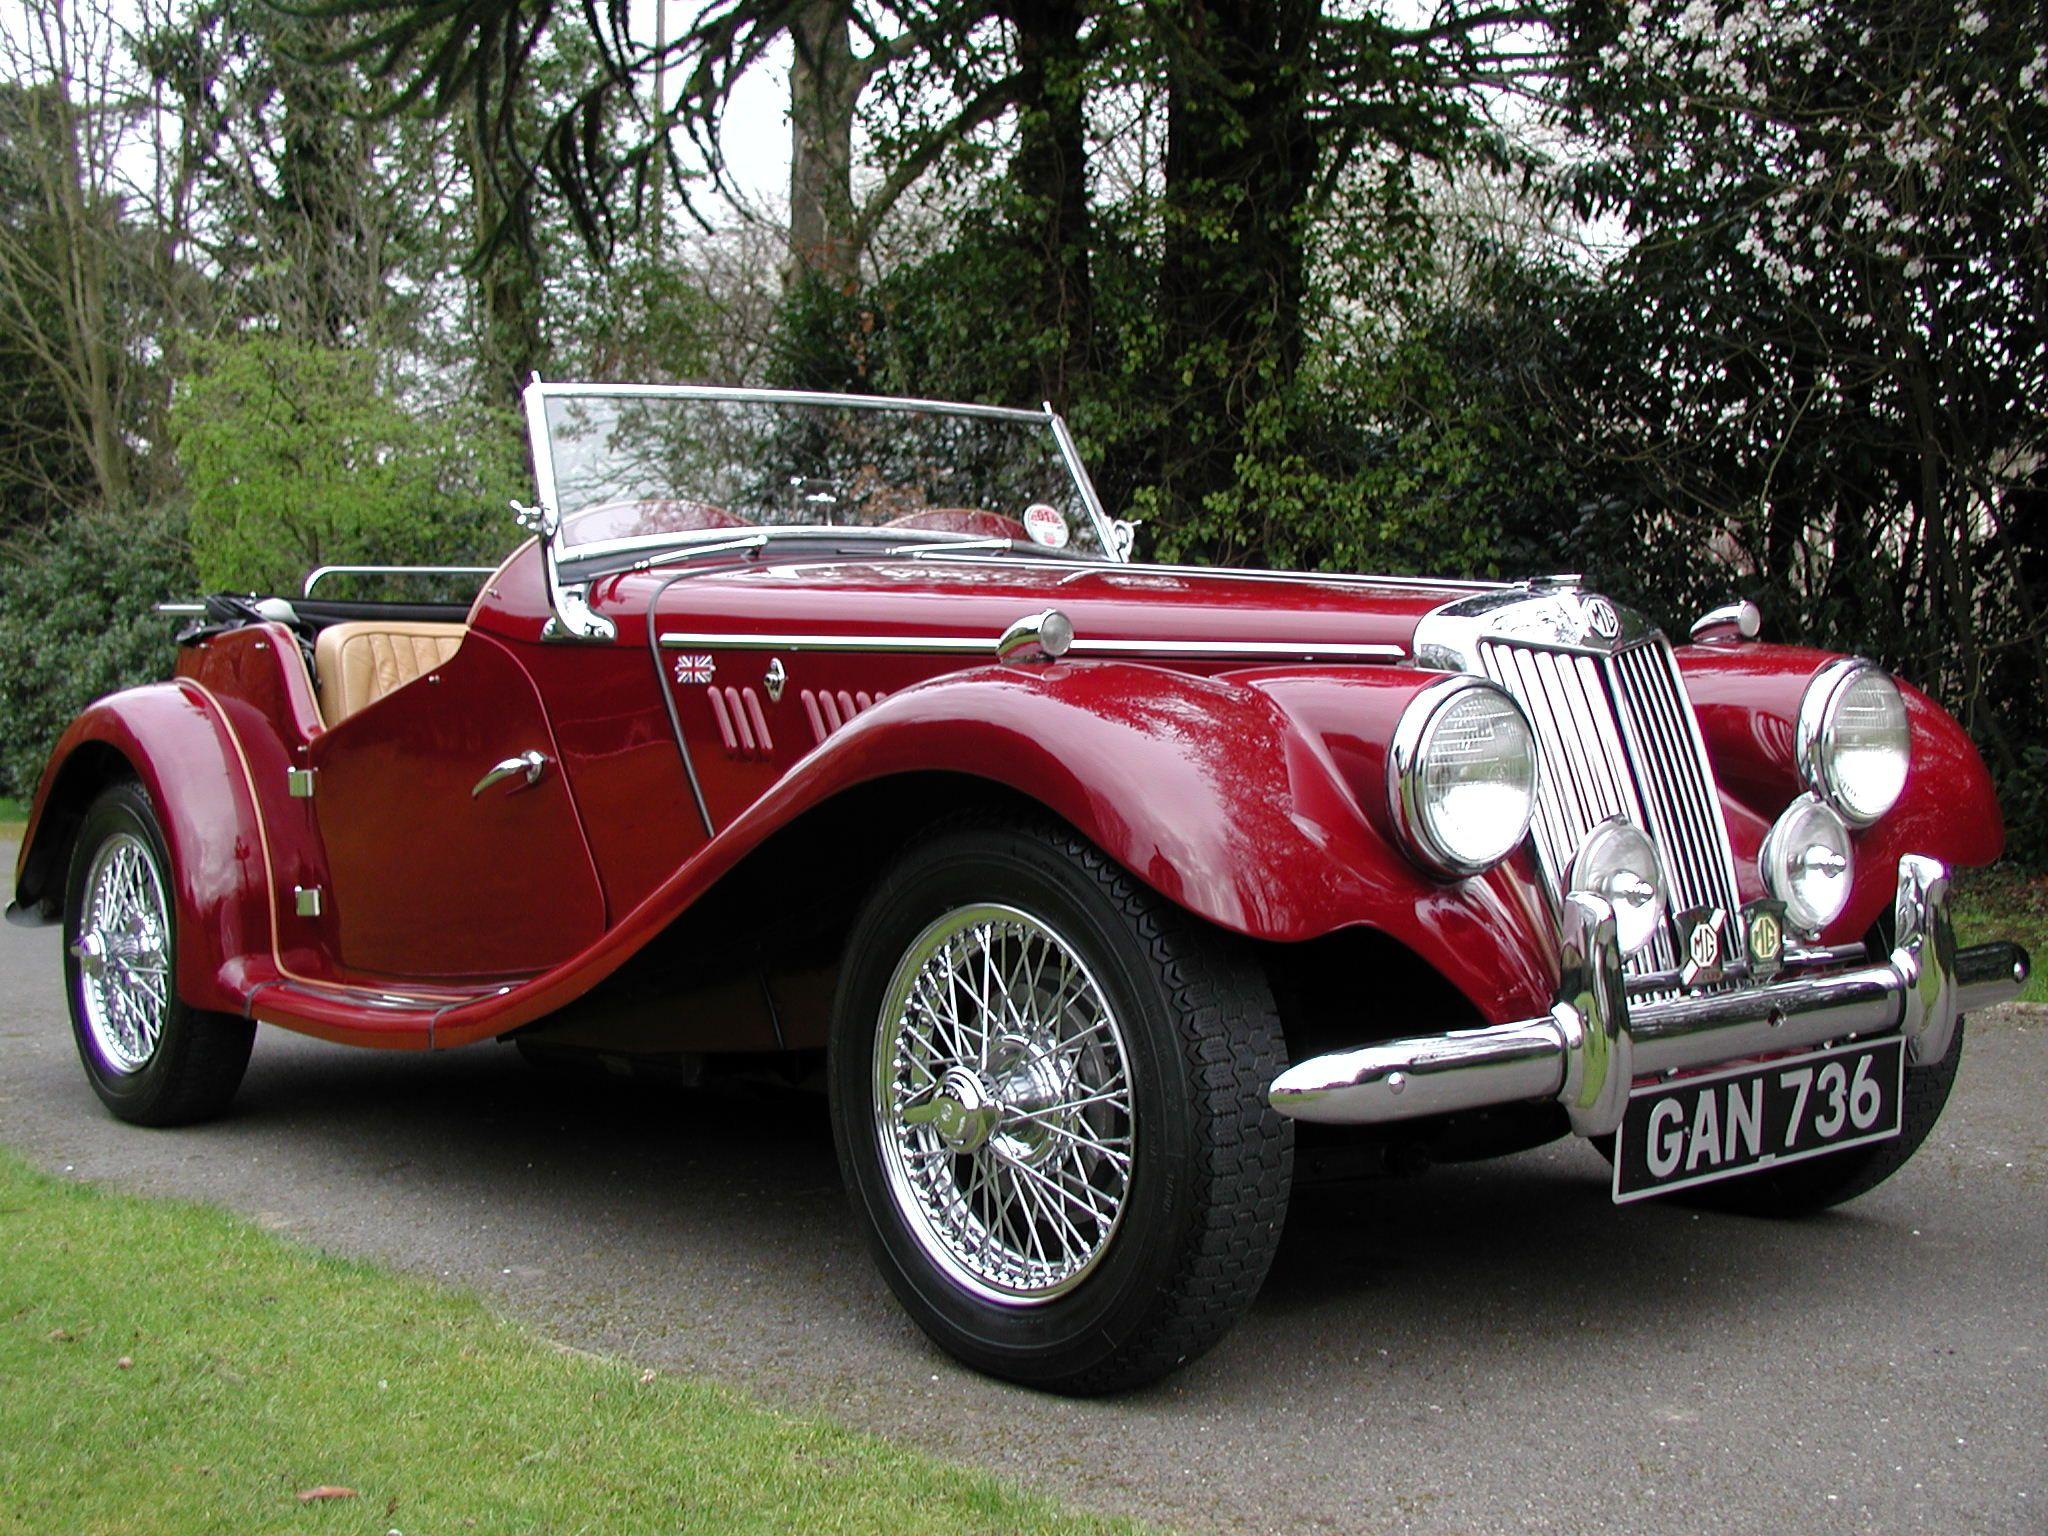 1954 MG TF Maintenance/restoration of old/vintage vehicles